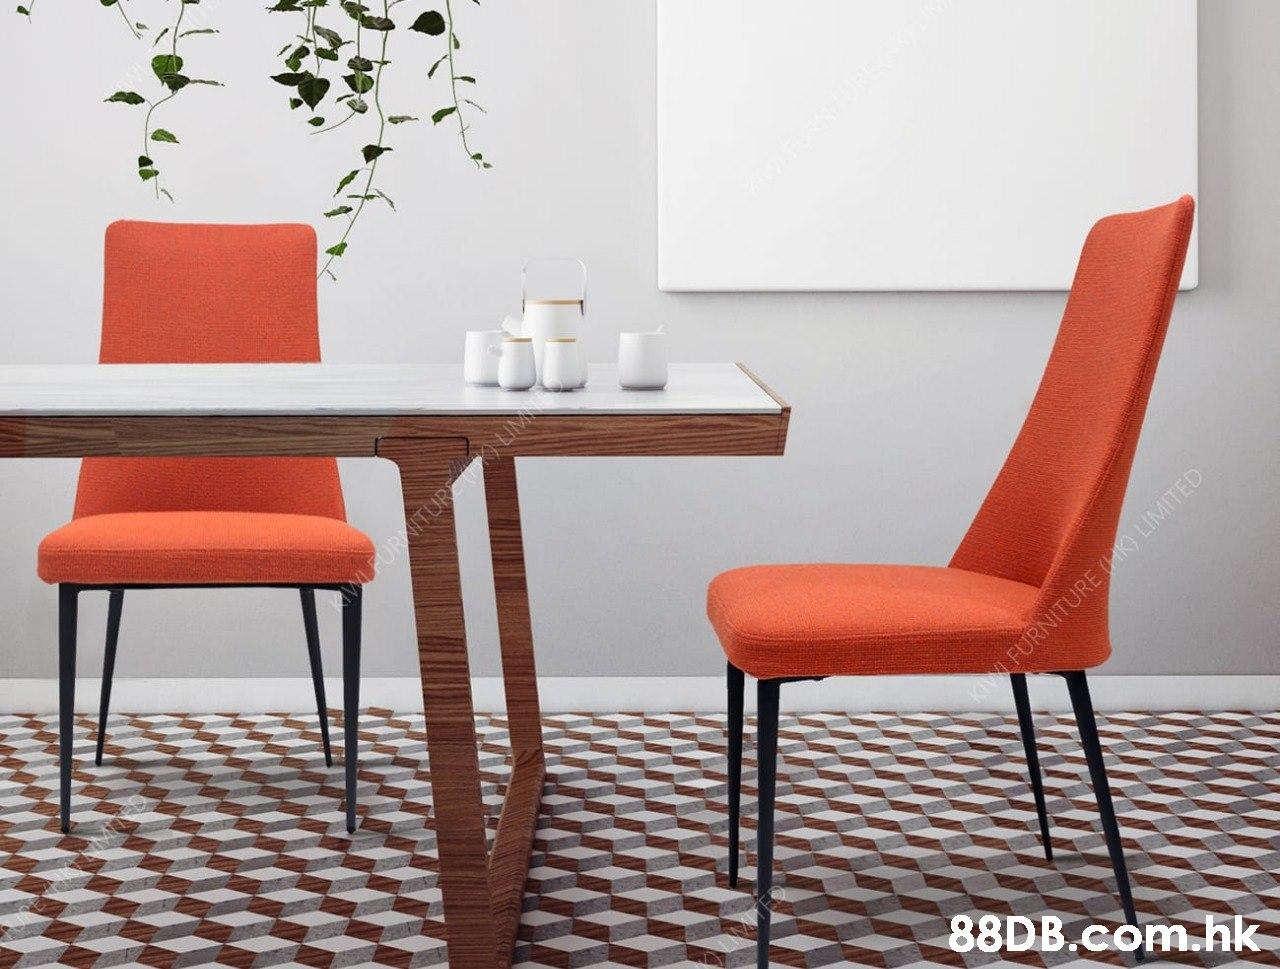 FURNITURE O LIMITED .hk  Furniture,Chair,Orange,Room,Table